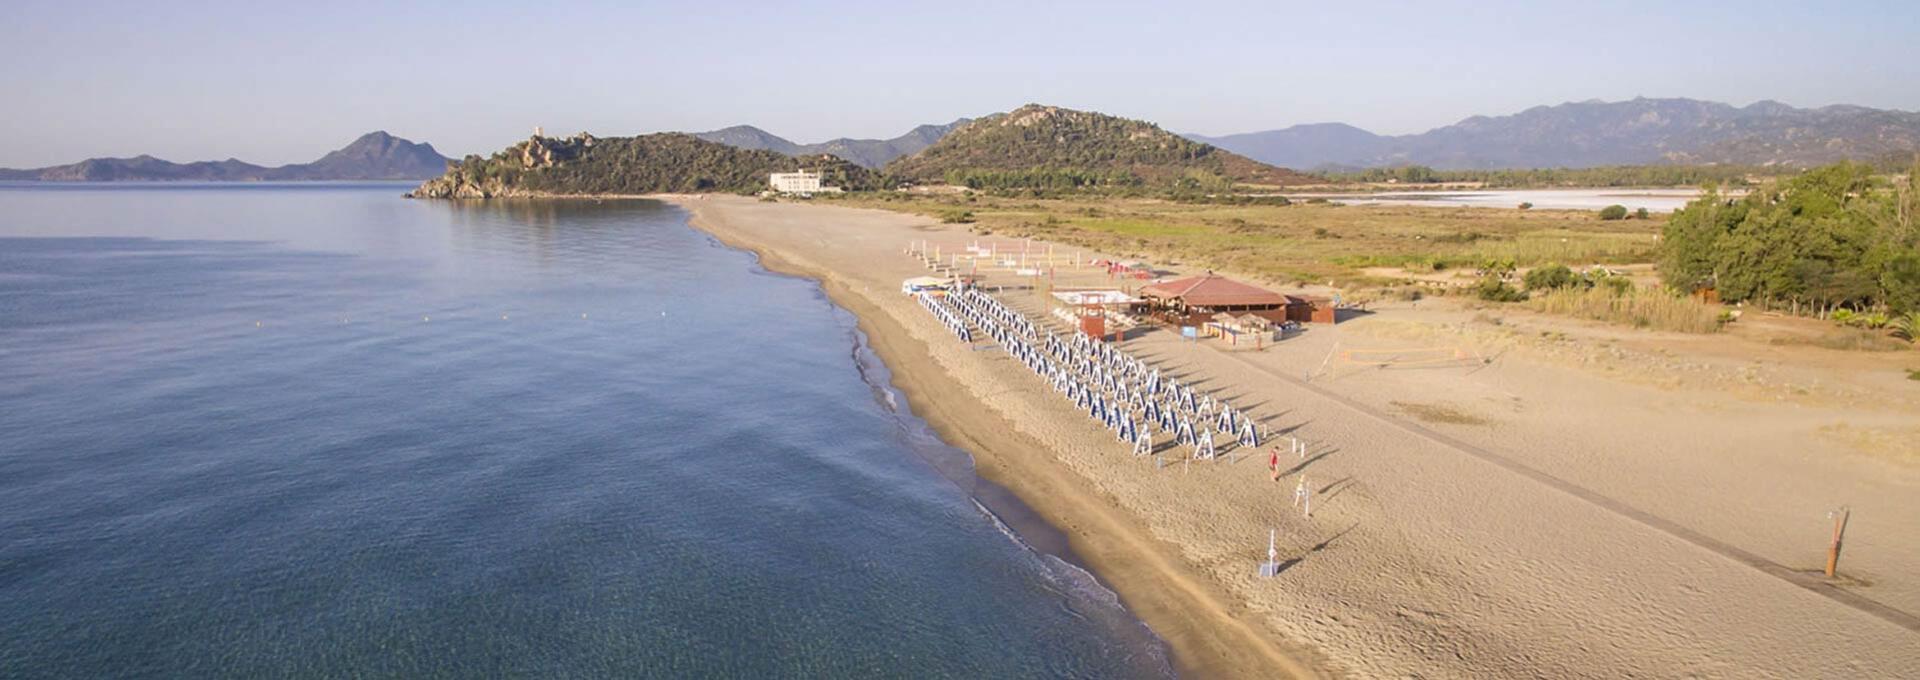 4mori en holiday-resort-sardinia 015